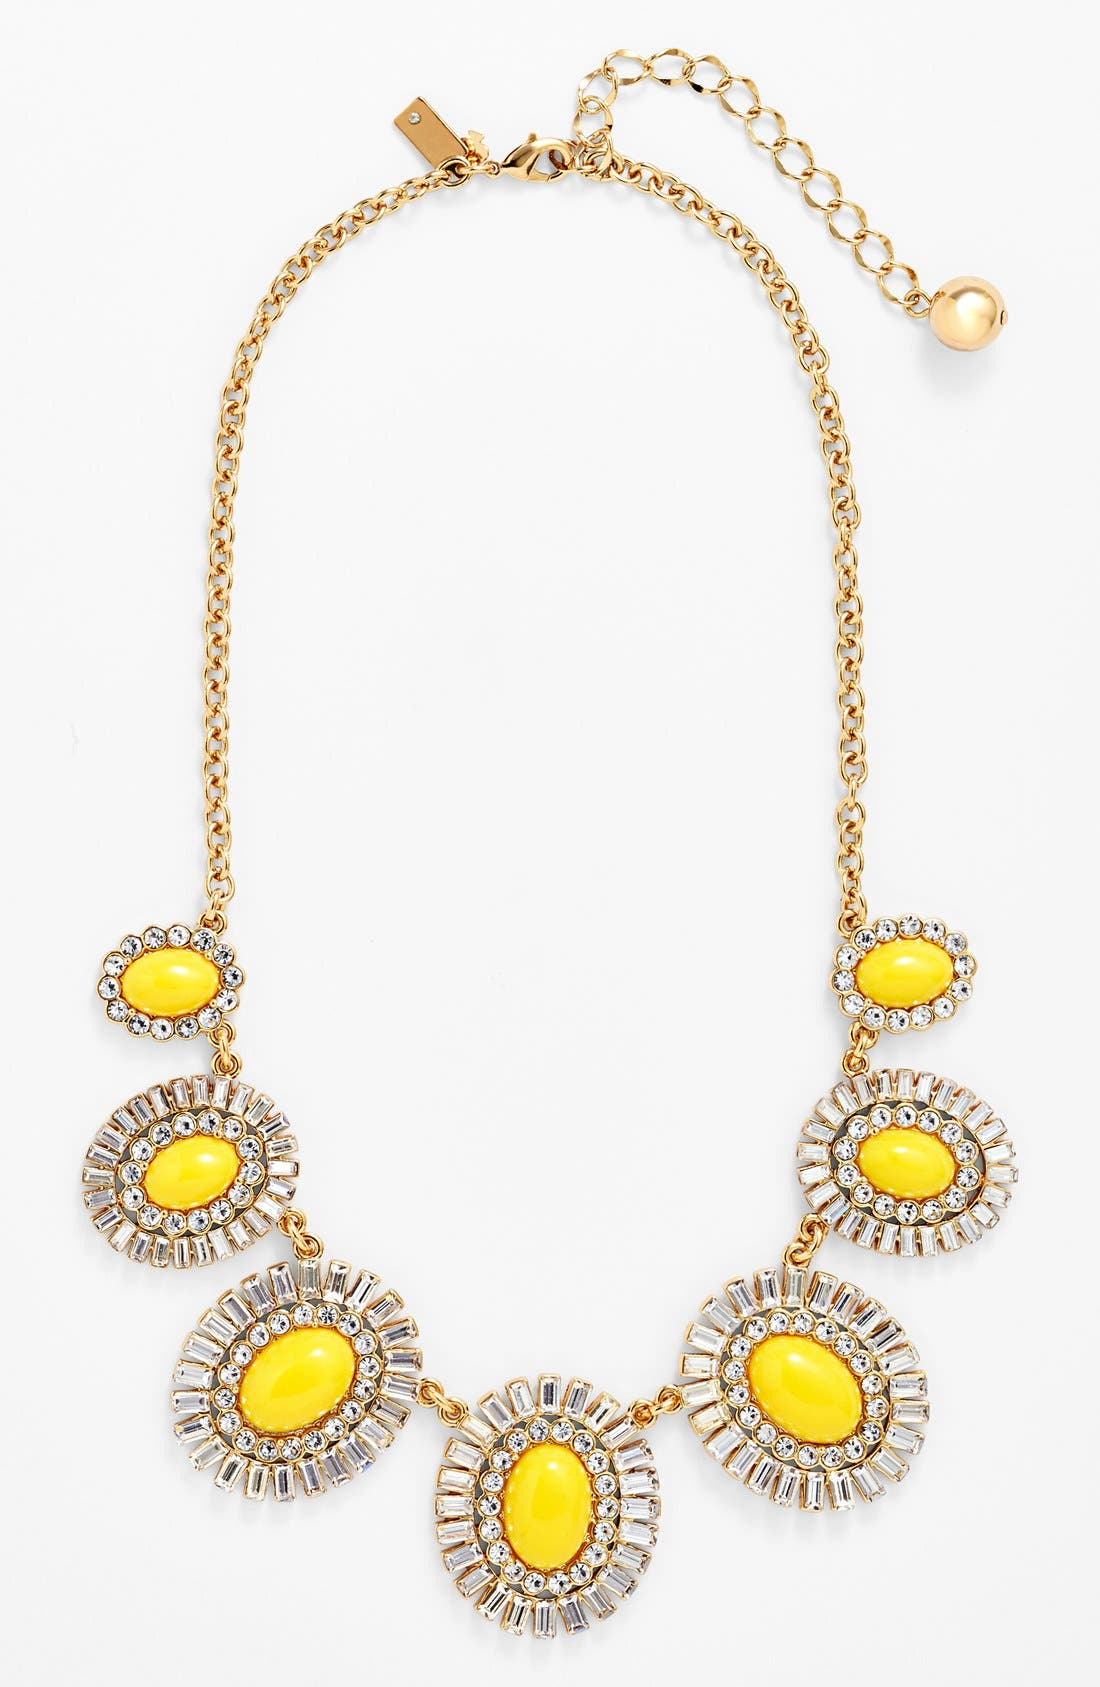 Main Image - kate spade new york 'capri garden' oval frontal necklace